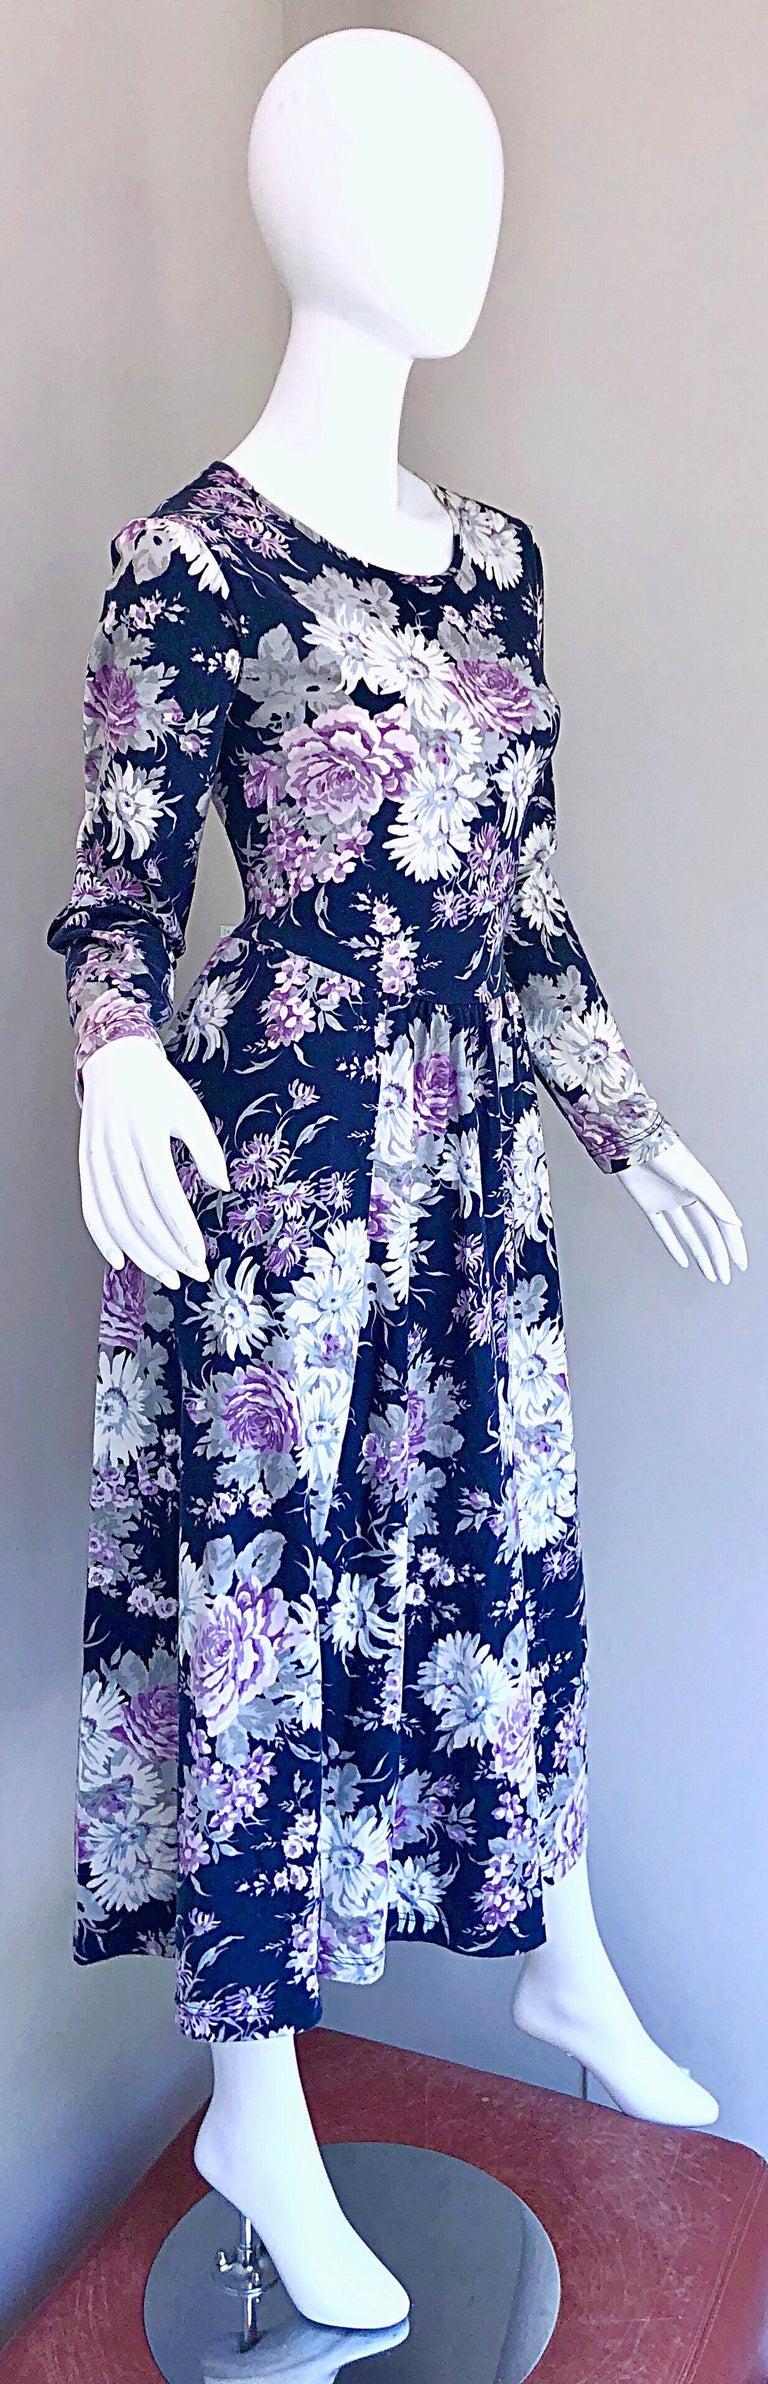 1990s Laura Ashley Navy Blue + Purple Long Sleeve Cotton Vintage 90s Midi Dress For Sale 4